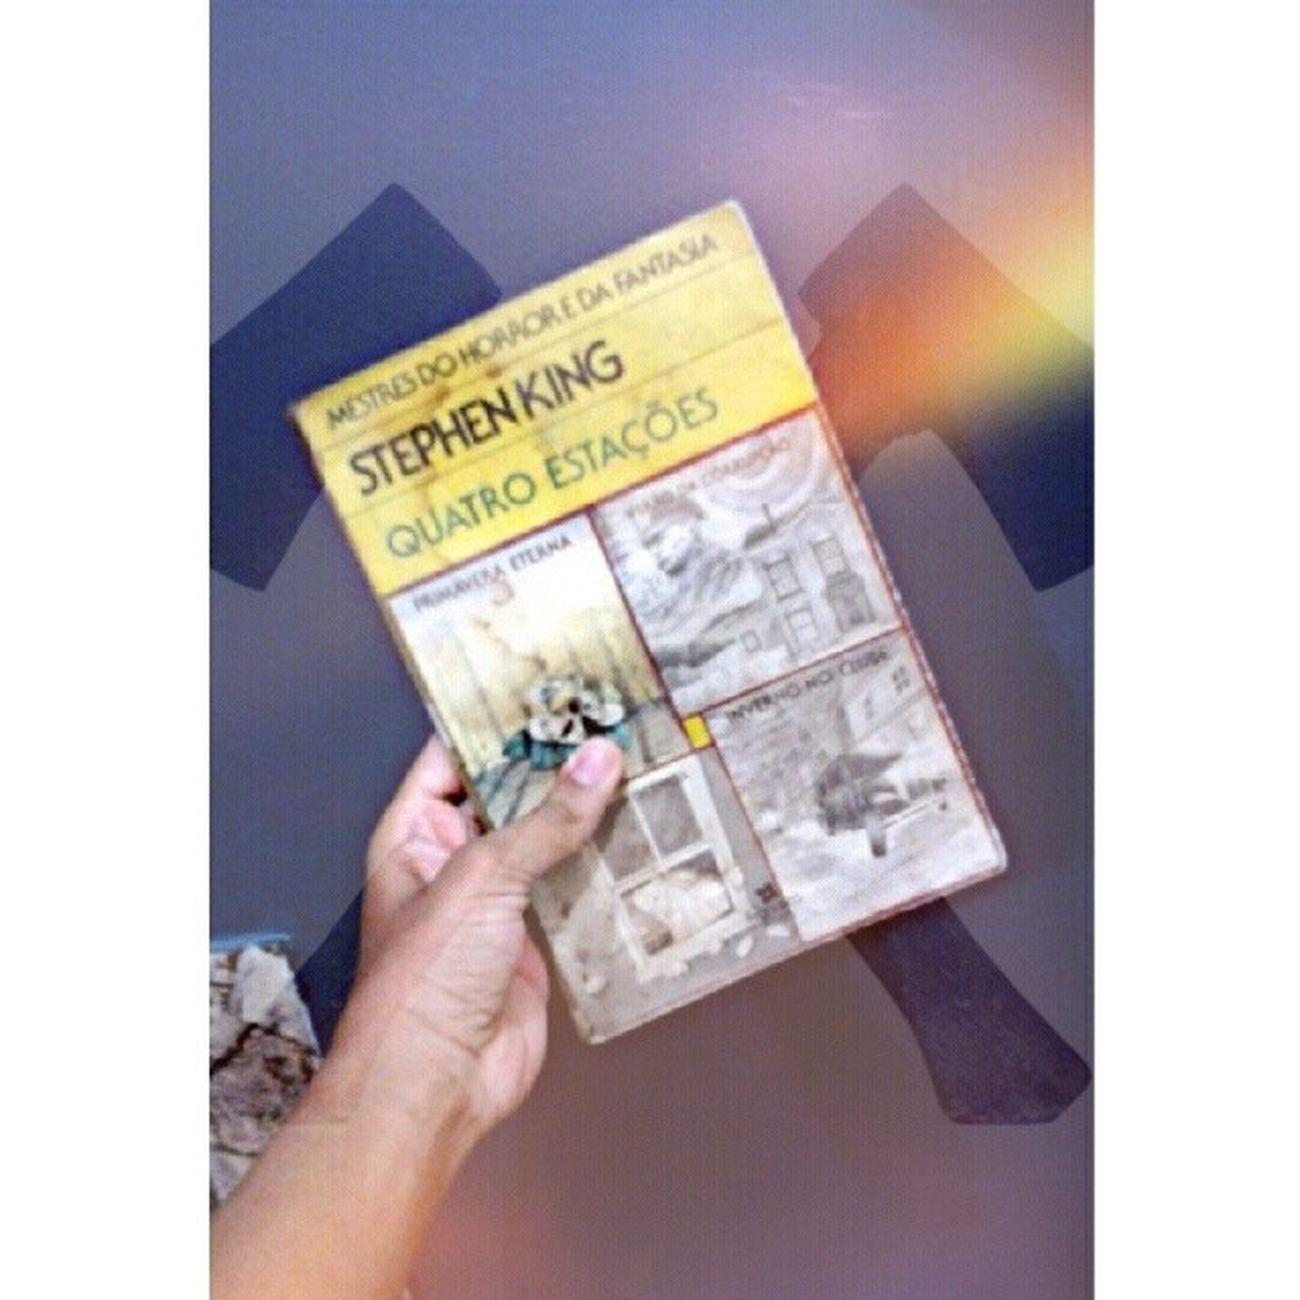 Book Lendo Quatroestaçoes Stephenking terror